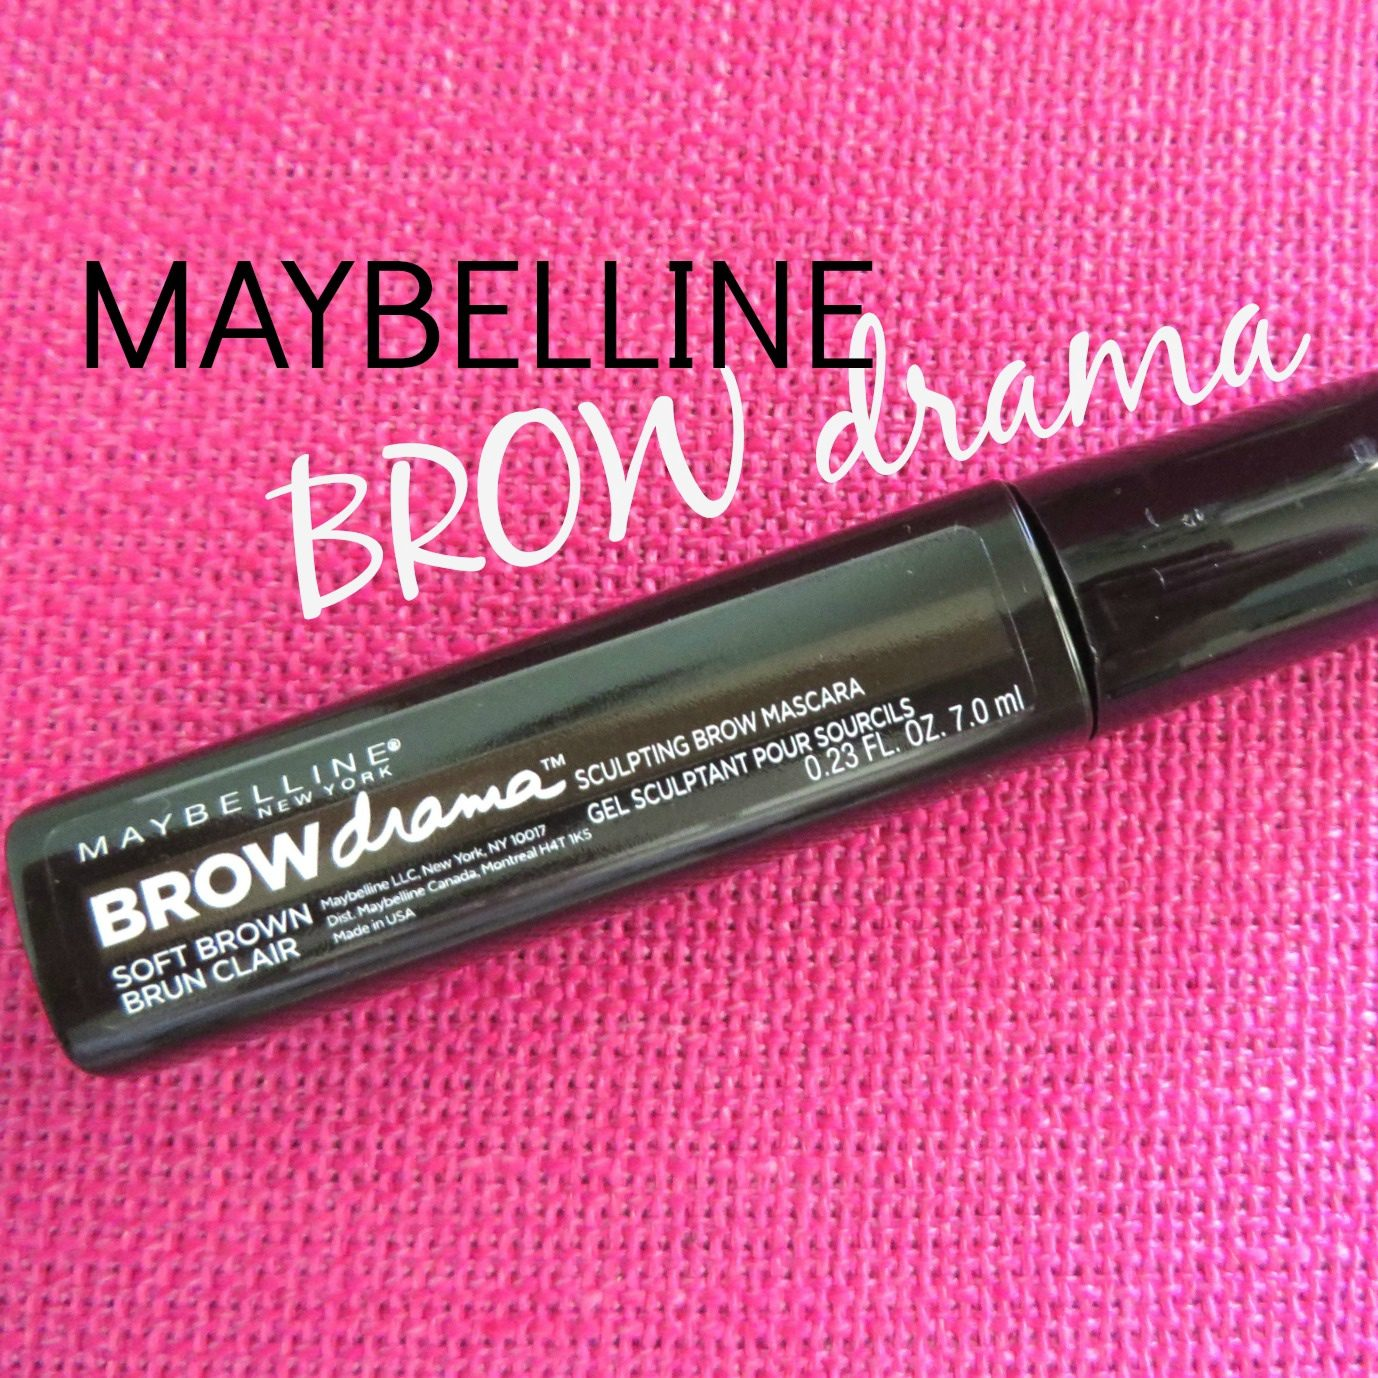 Maybelline Brow Drama